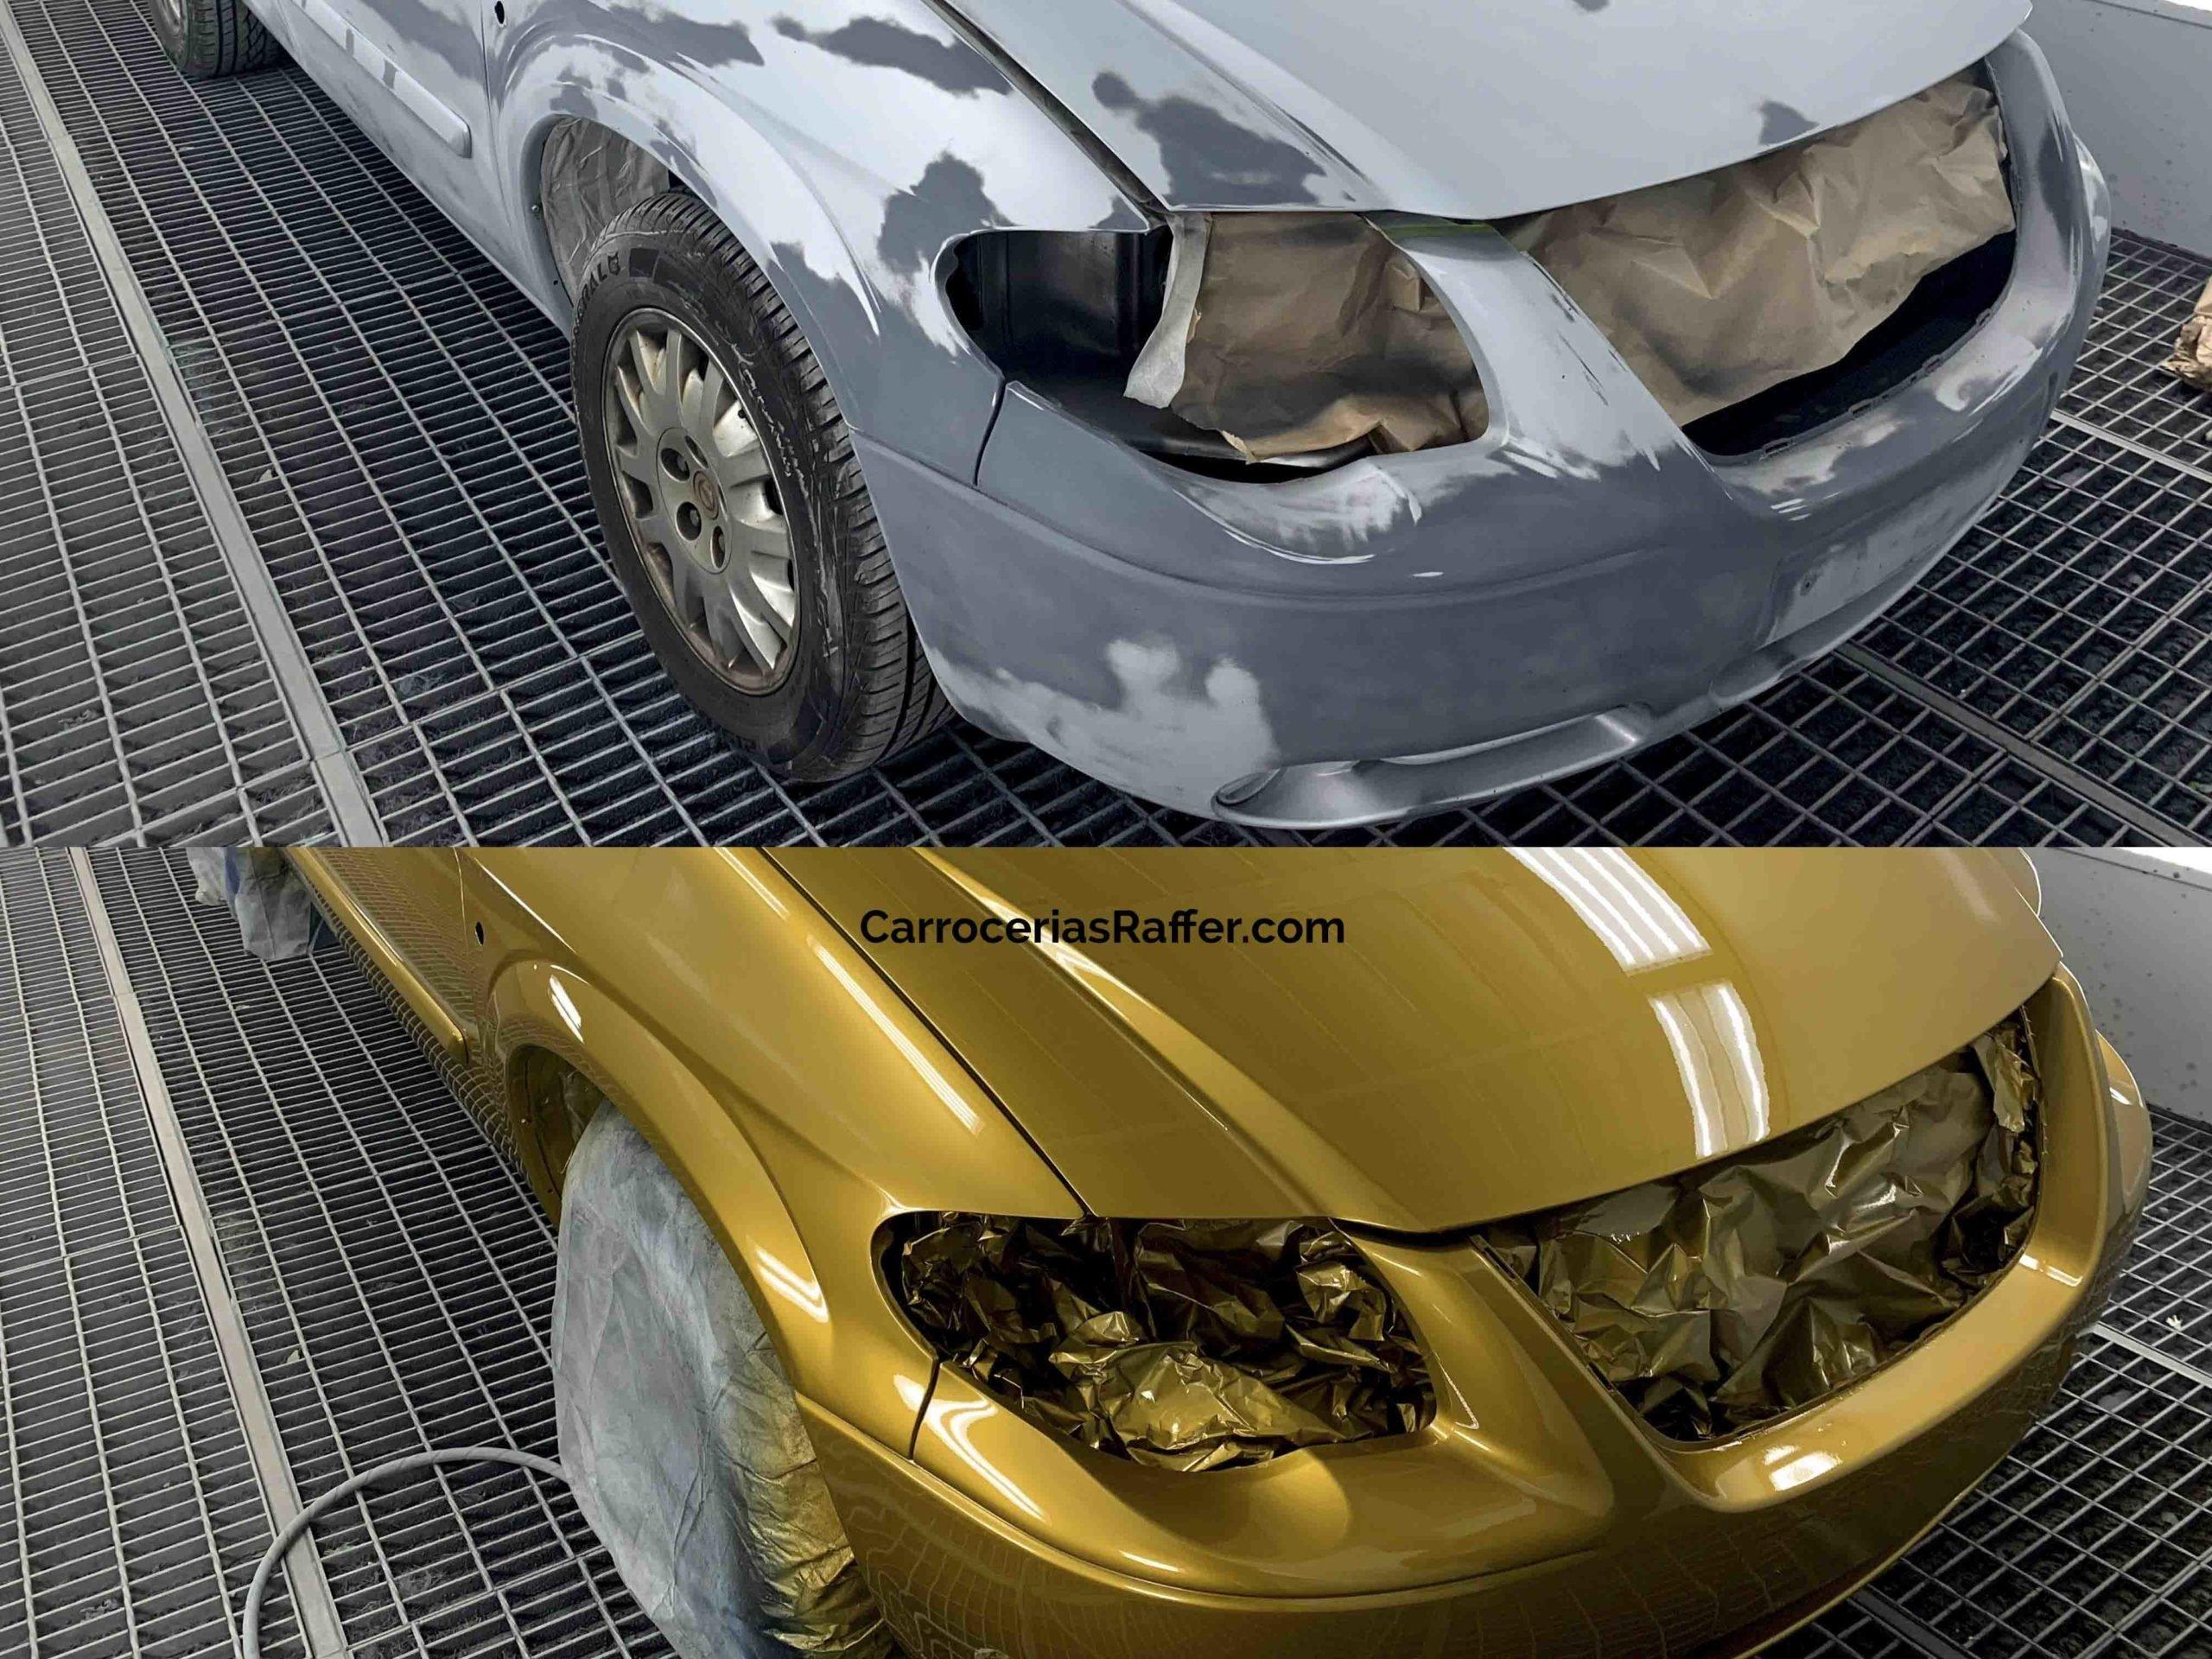 00002 chrysler voyager amarillo curcuma carrocerias raffer pintar furgoneta hernani gipuzkoa donostia san sebastian copia